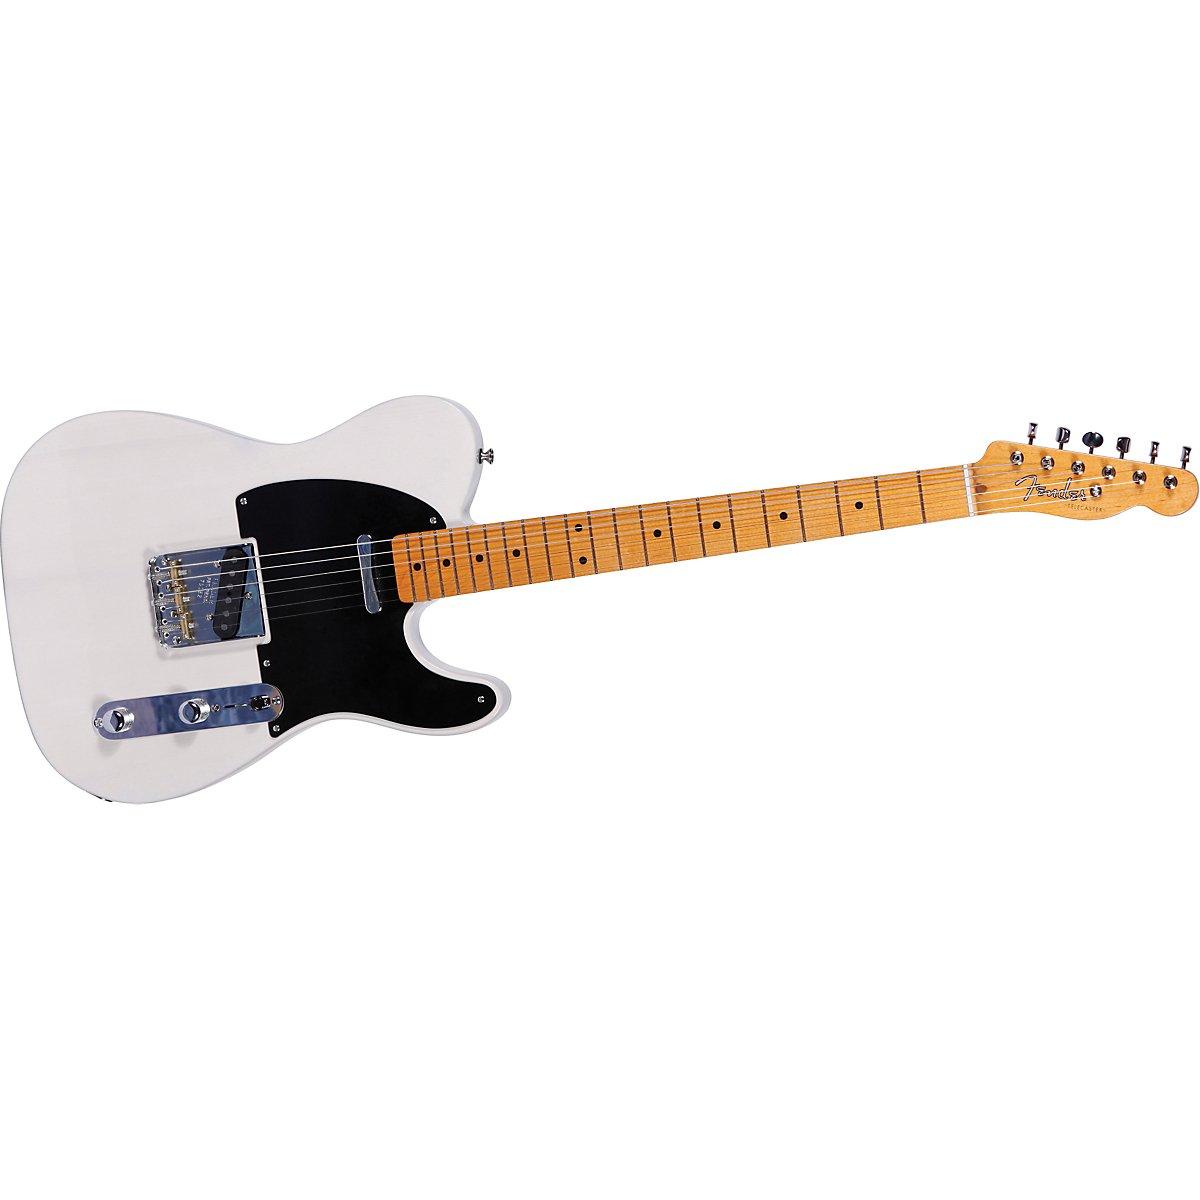 Amazon.com: 60th aniversario Old Pine Telecaster Guitarra ...